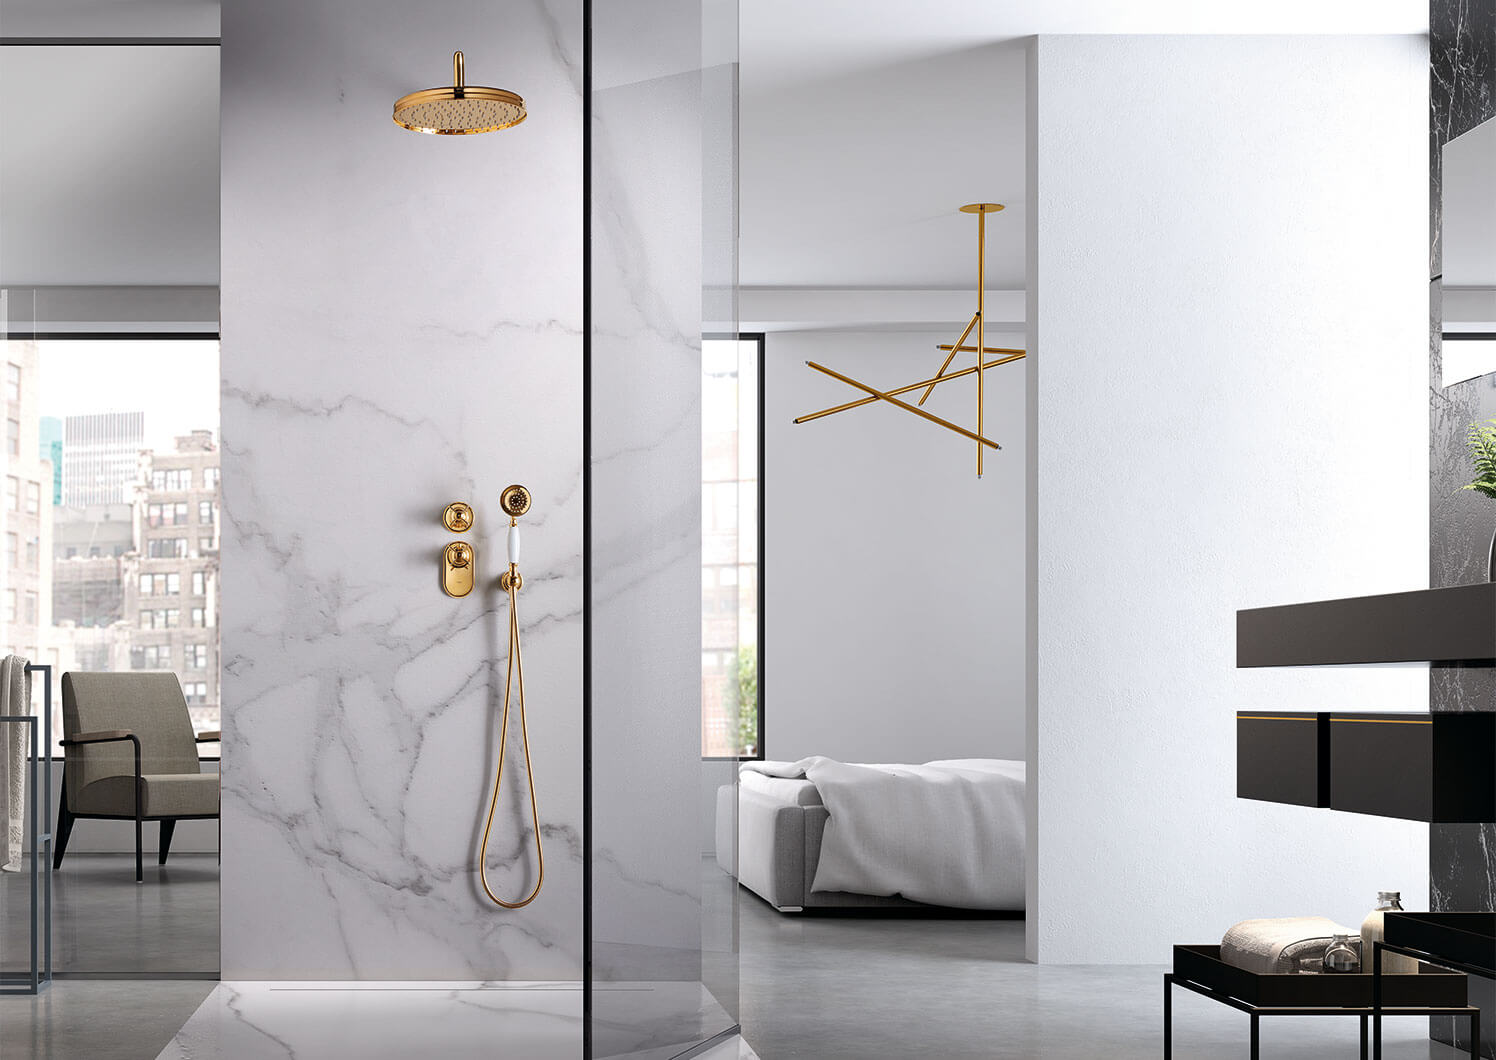 Tres-clasic Shower Technology